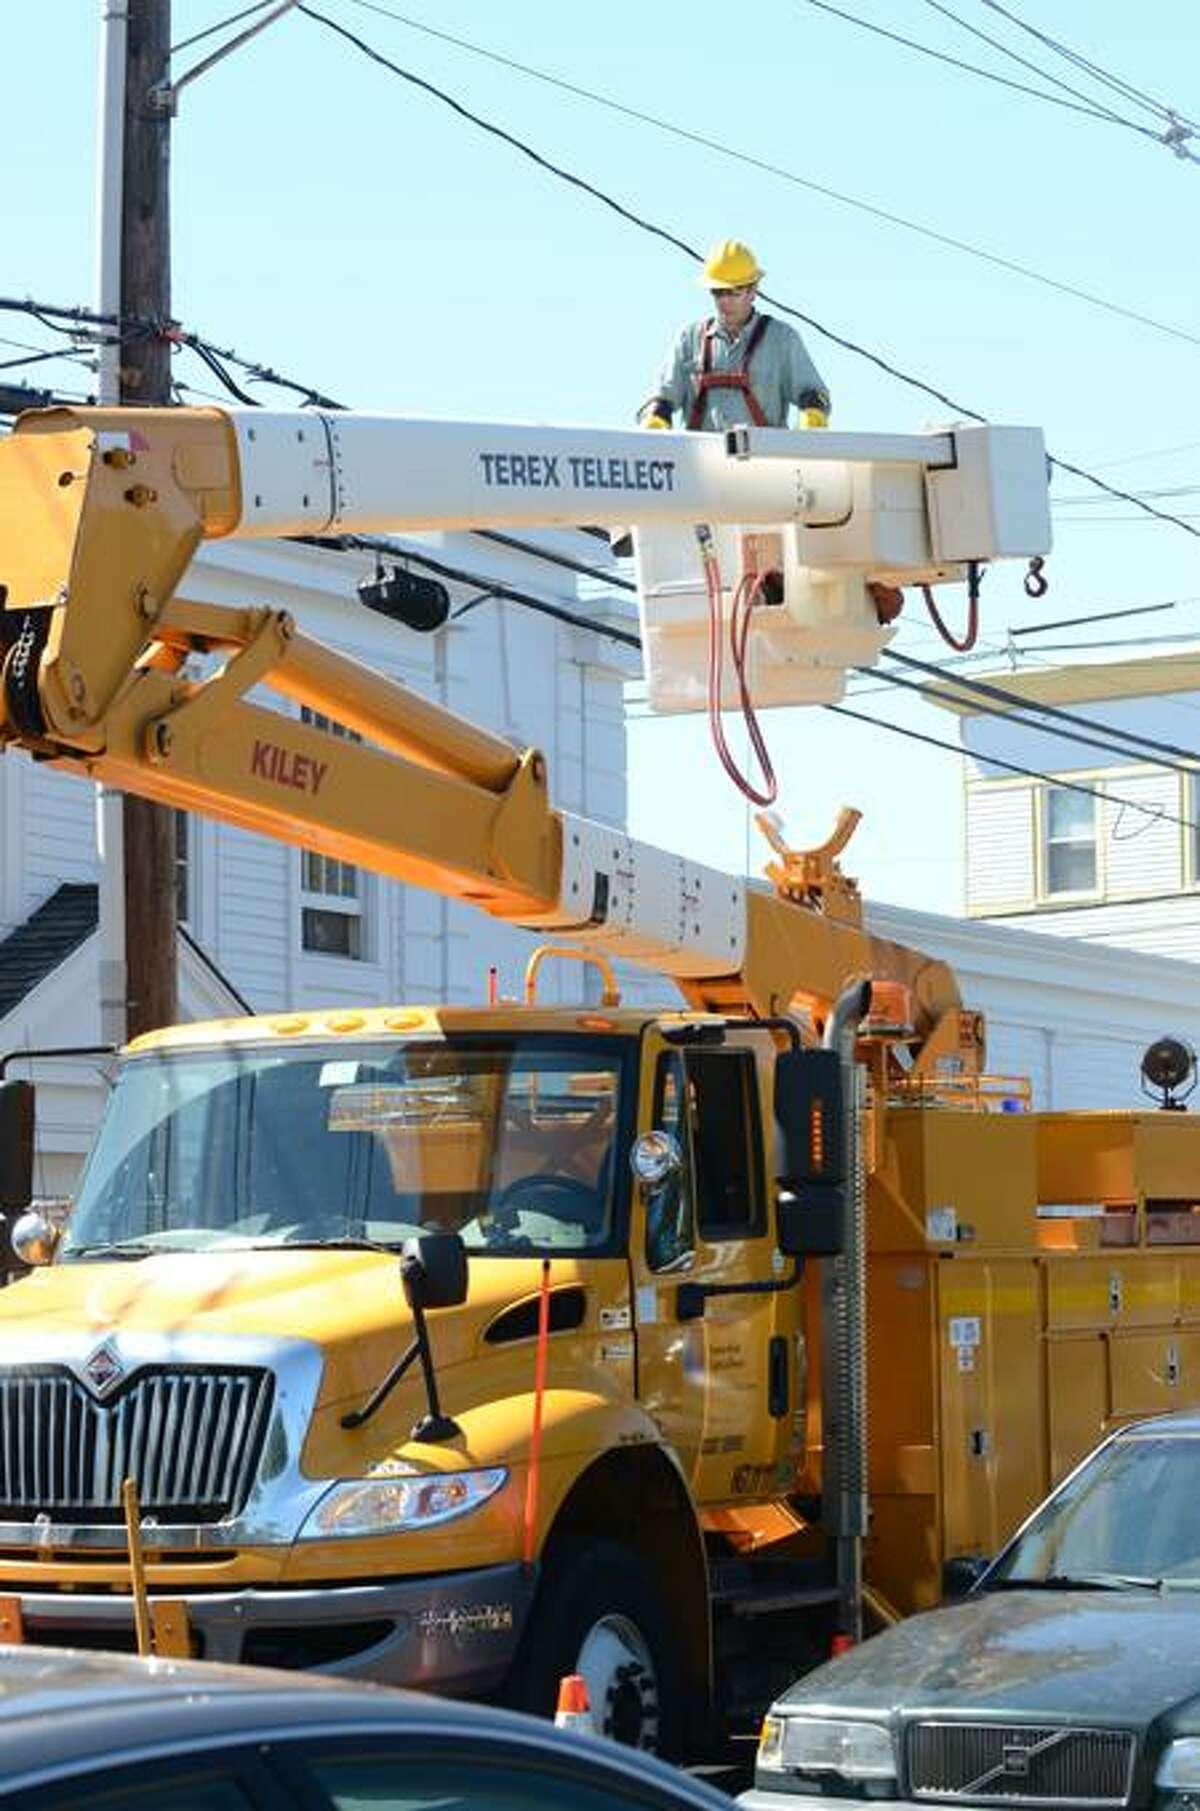 A Connecticut Light & Power crew works on power lines last week following Hurricane Irene. VM Williams/Register